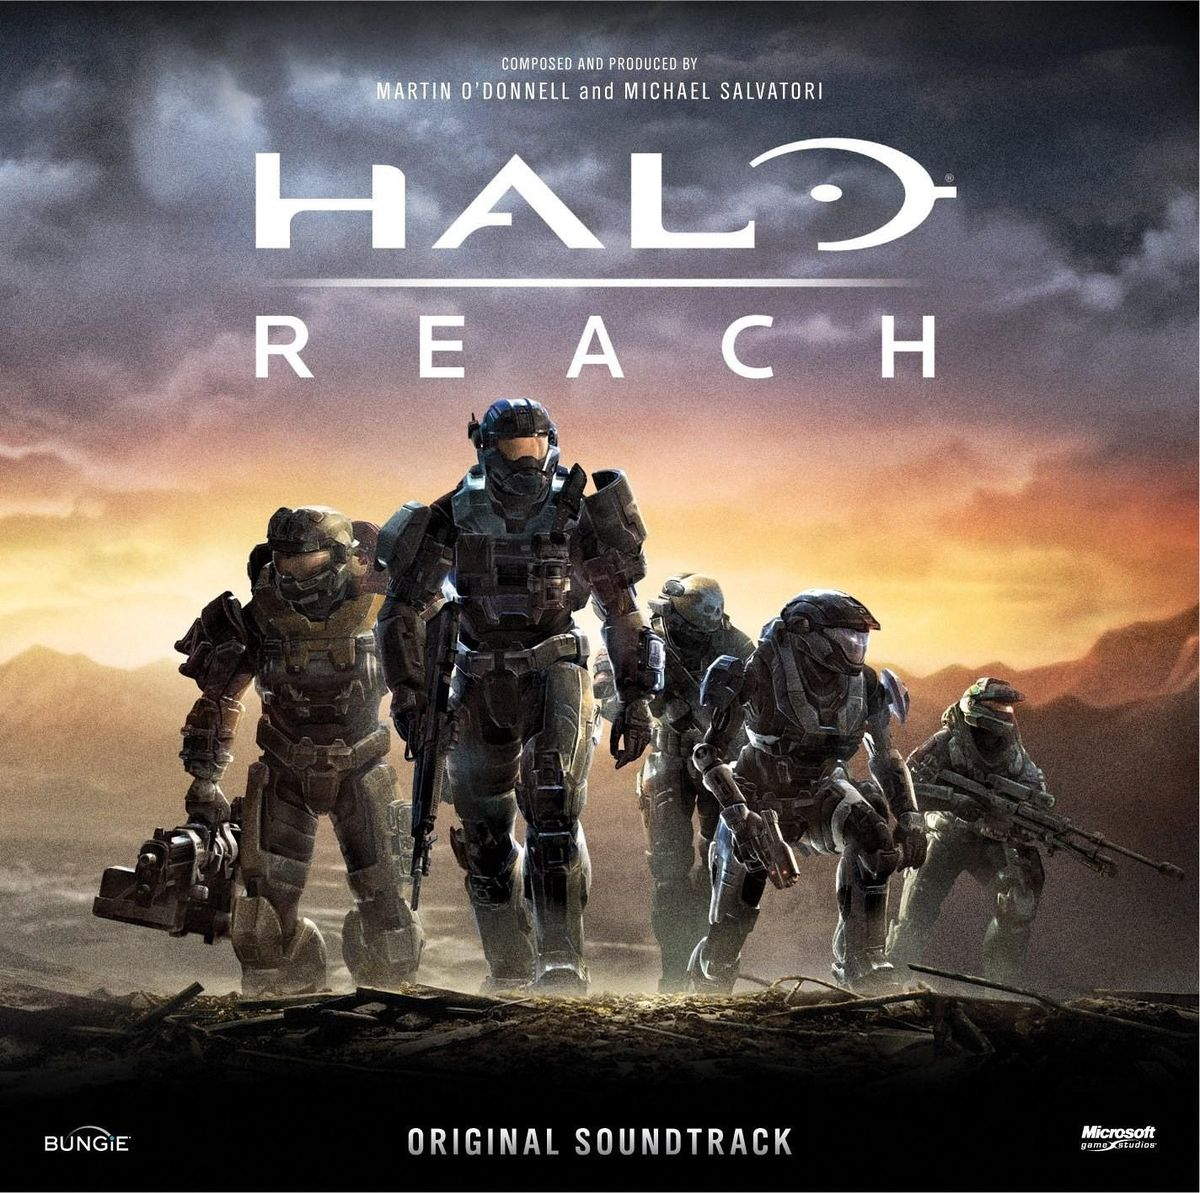 Halo: Reach Original Soundtrack - Halopedia, the Halo